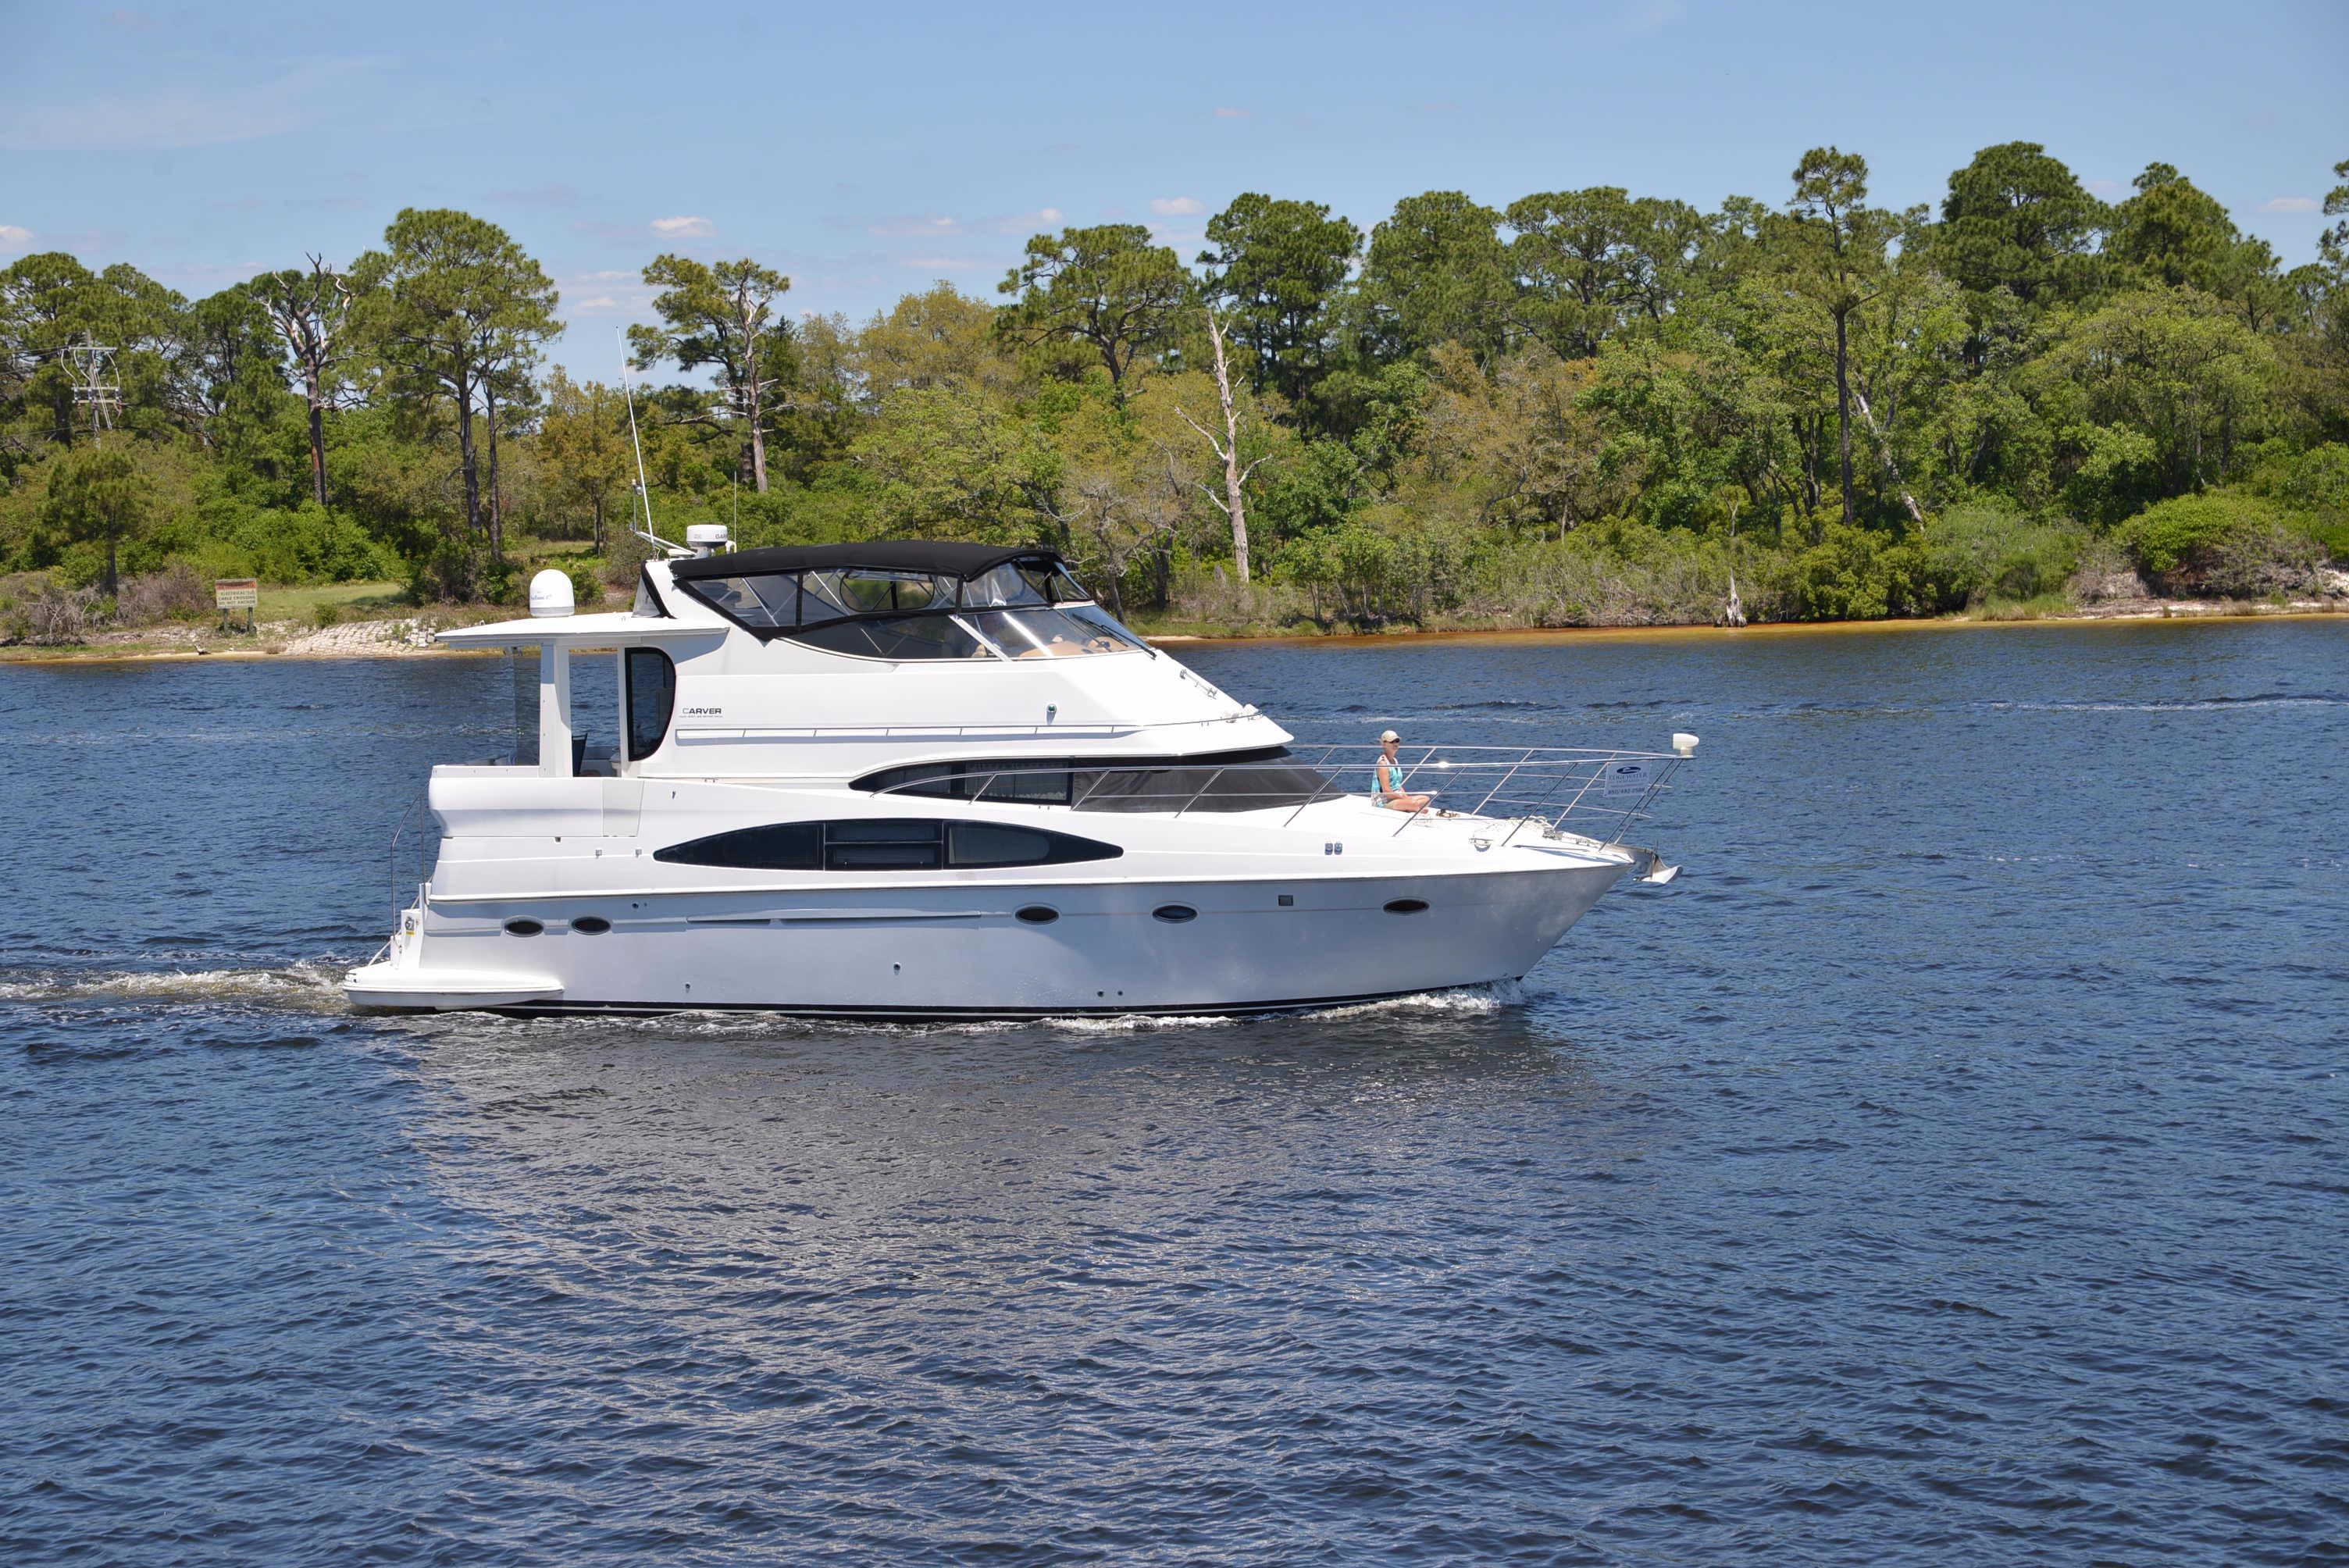 2001 Carver 466 Motor Yacht Power Boat For Sale - www ...